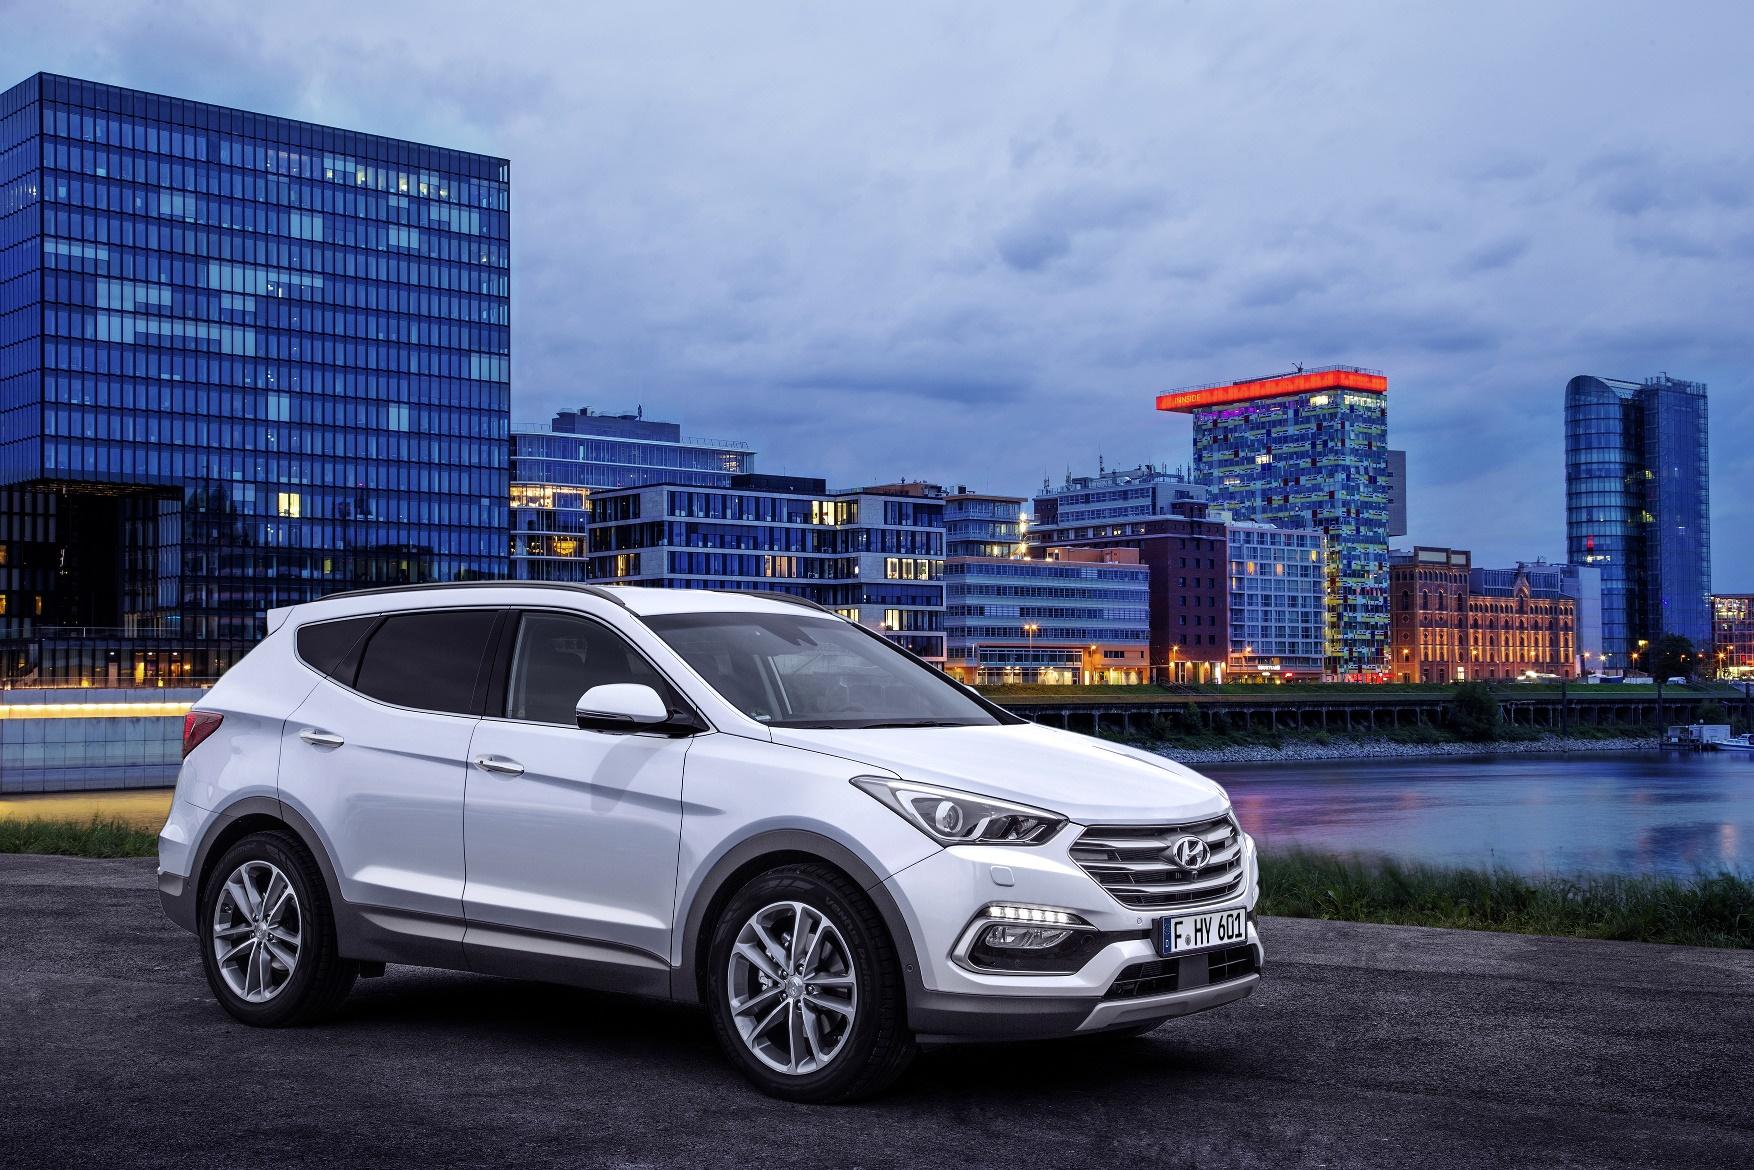 Refreshed Hyundai Santa Fe Revealed Ahead Frankfurt